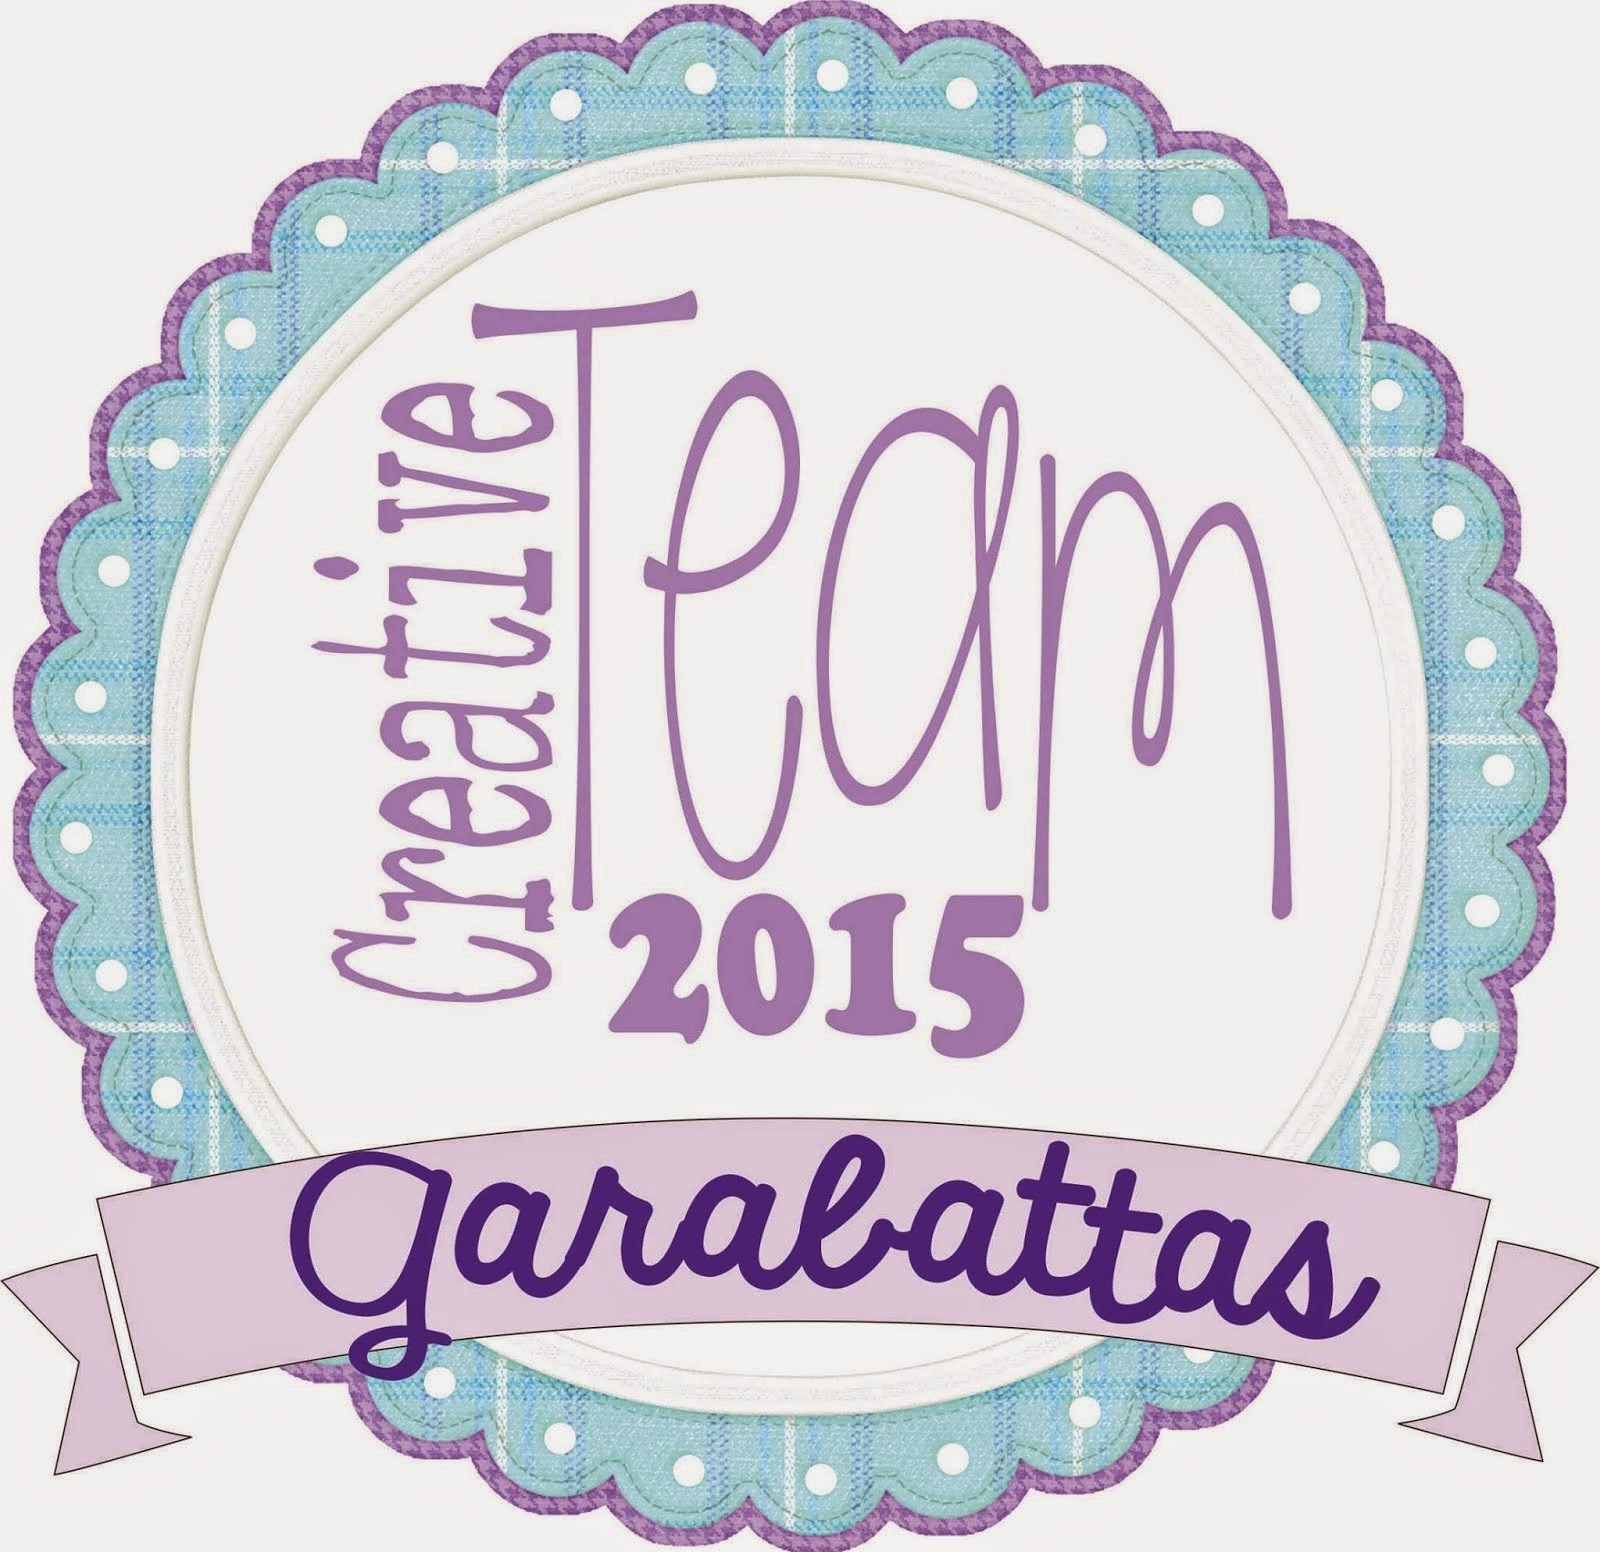 CT 2015 Garabattas